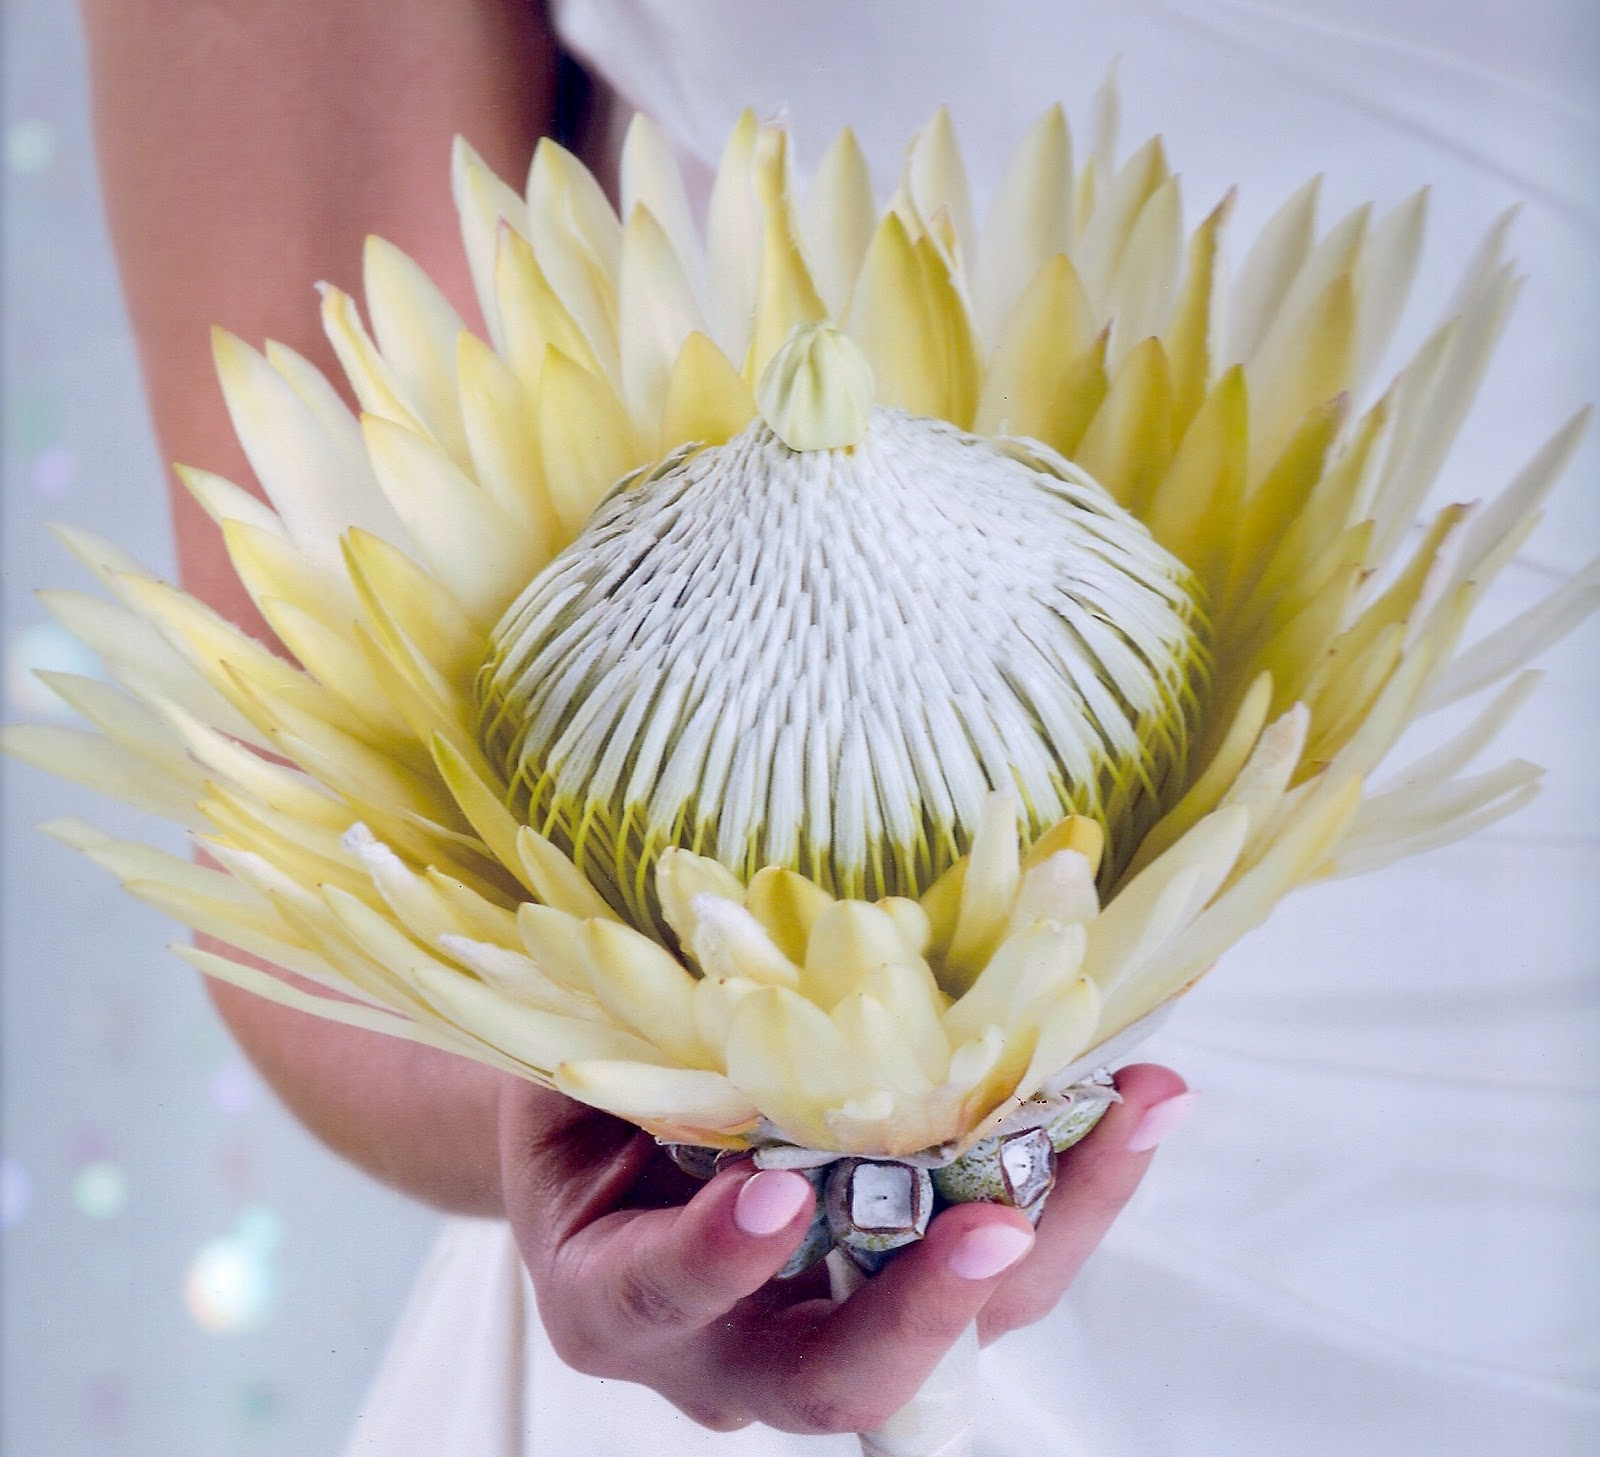 Protea Wedding Flowers: A Passion For Flowers: Unique Wedding Bouquets: The Protea